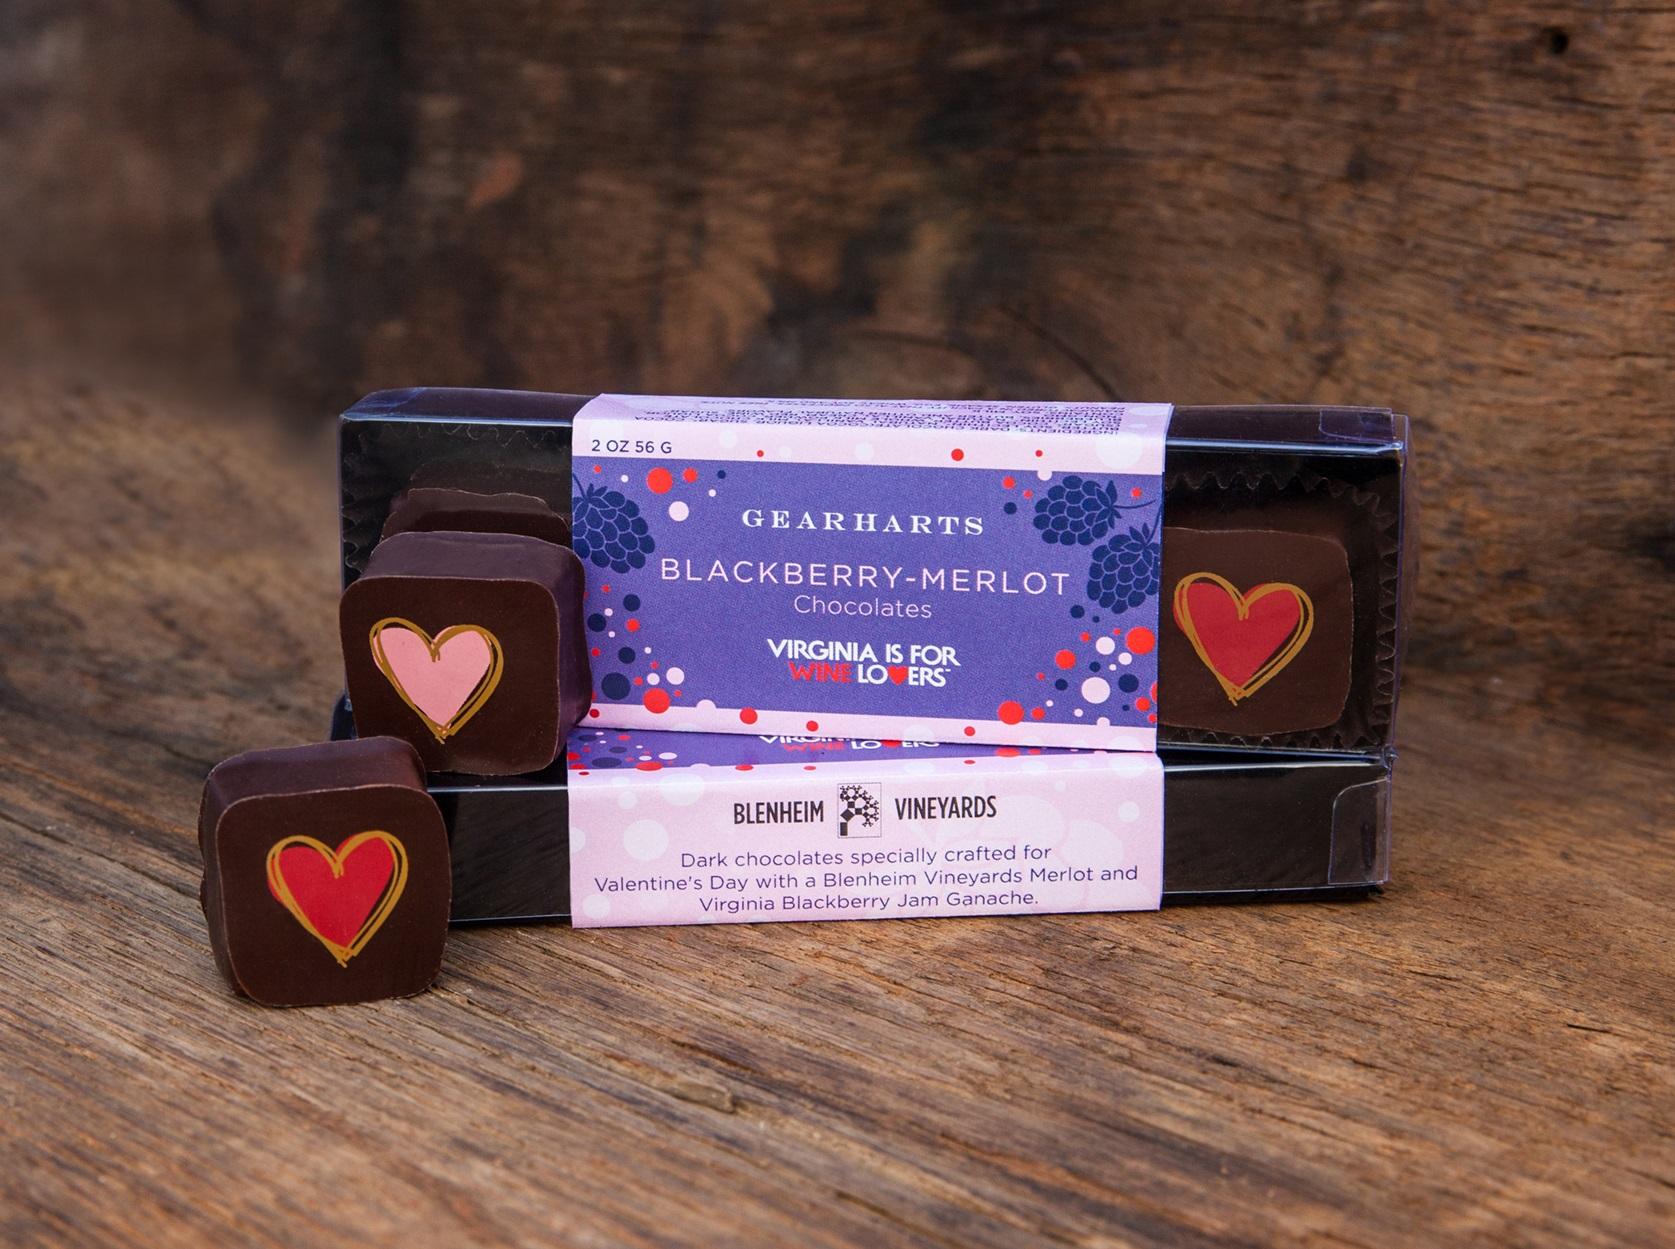 Gearharts Chocolates Blackberry Merlot Blenheim Vineyards